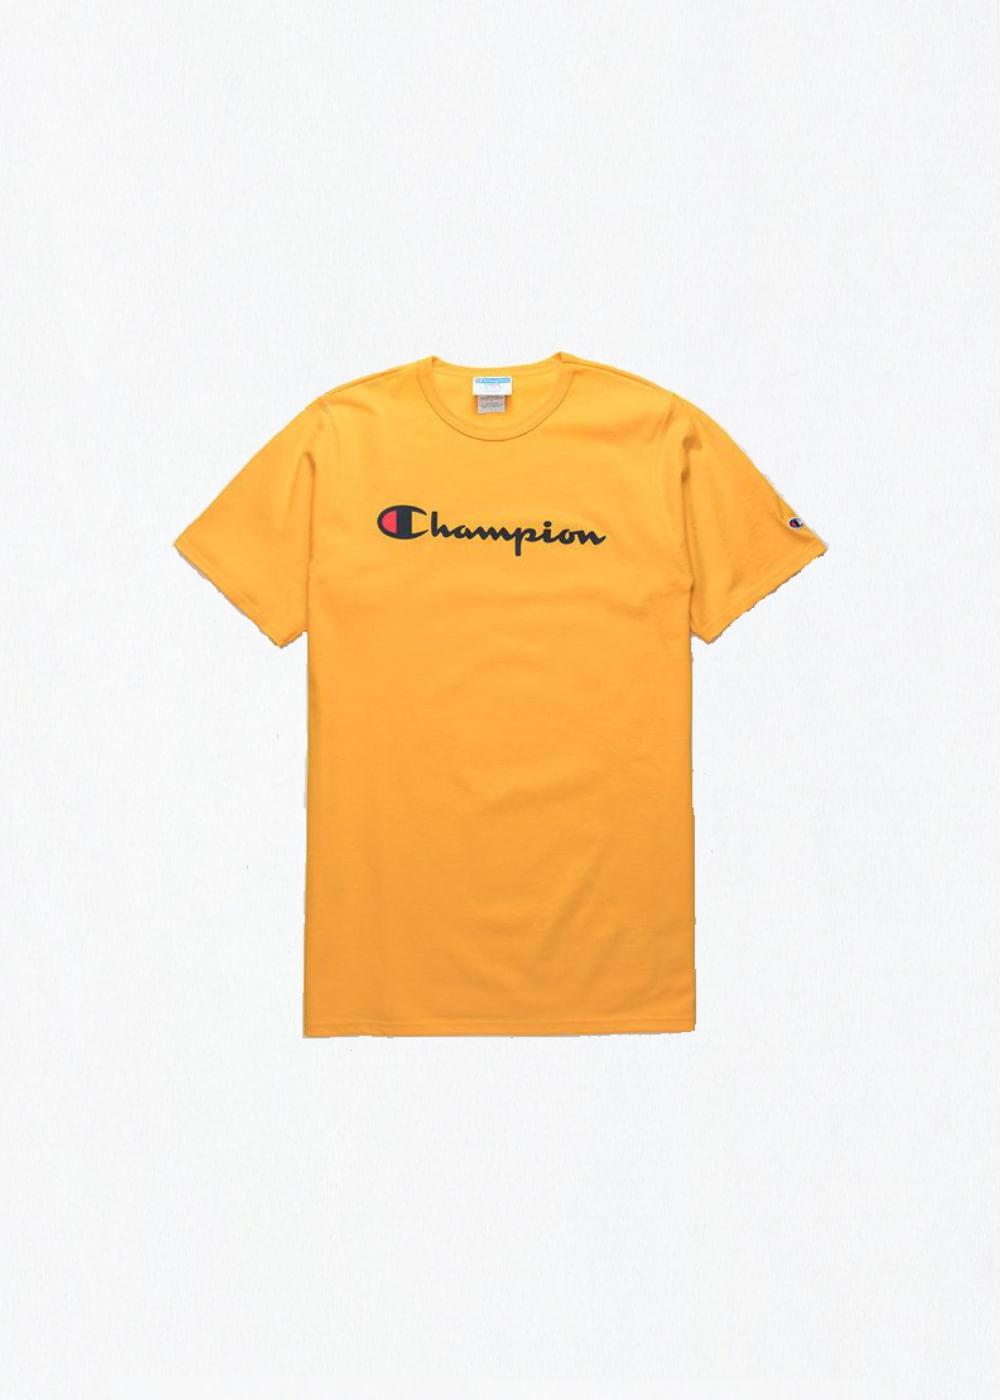 camiseta-champion-amarela